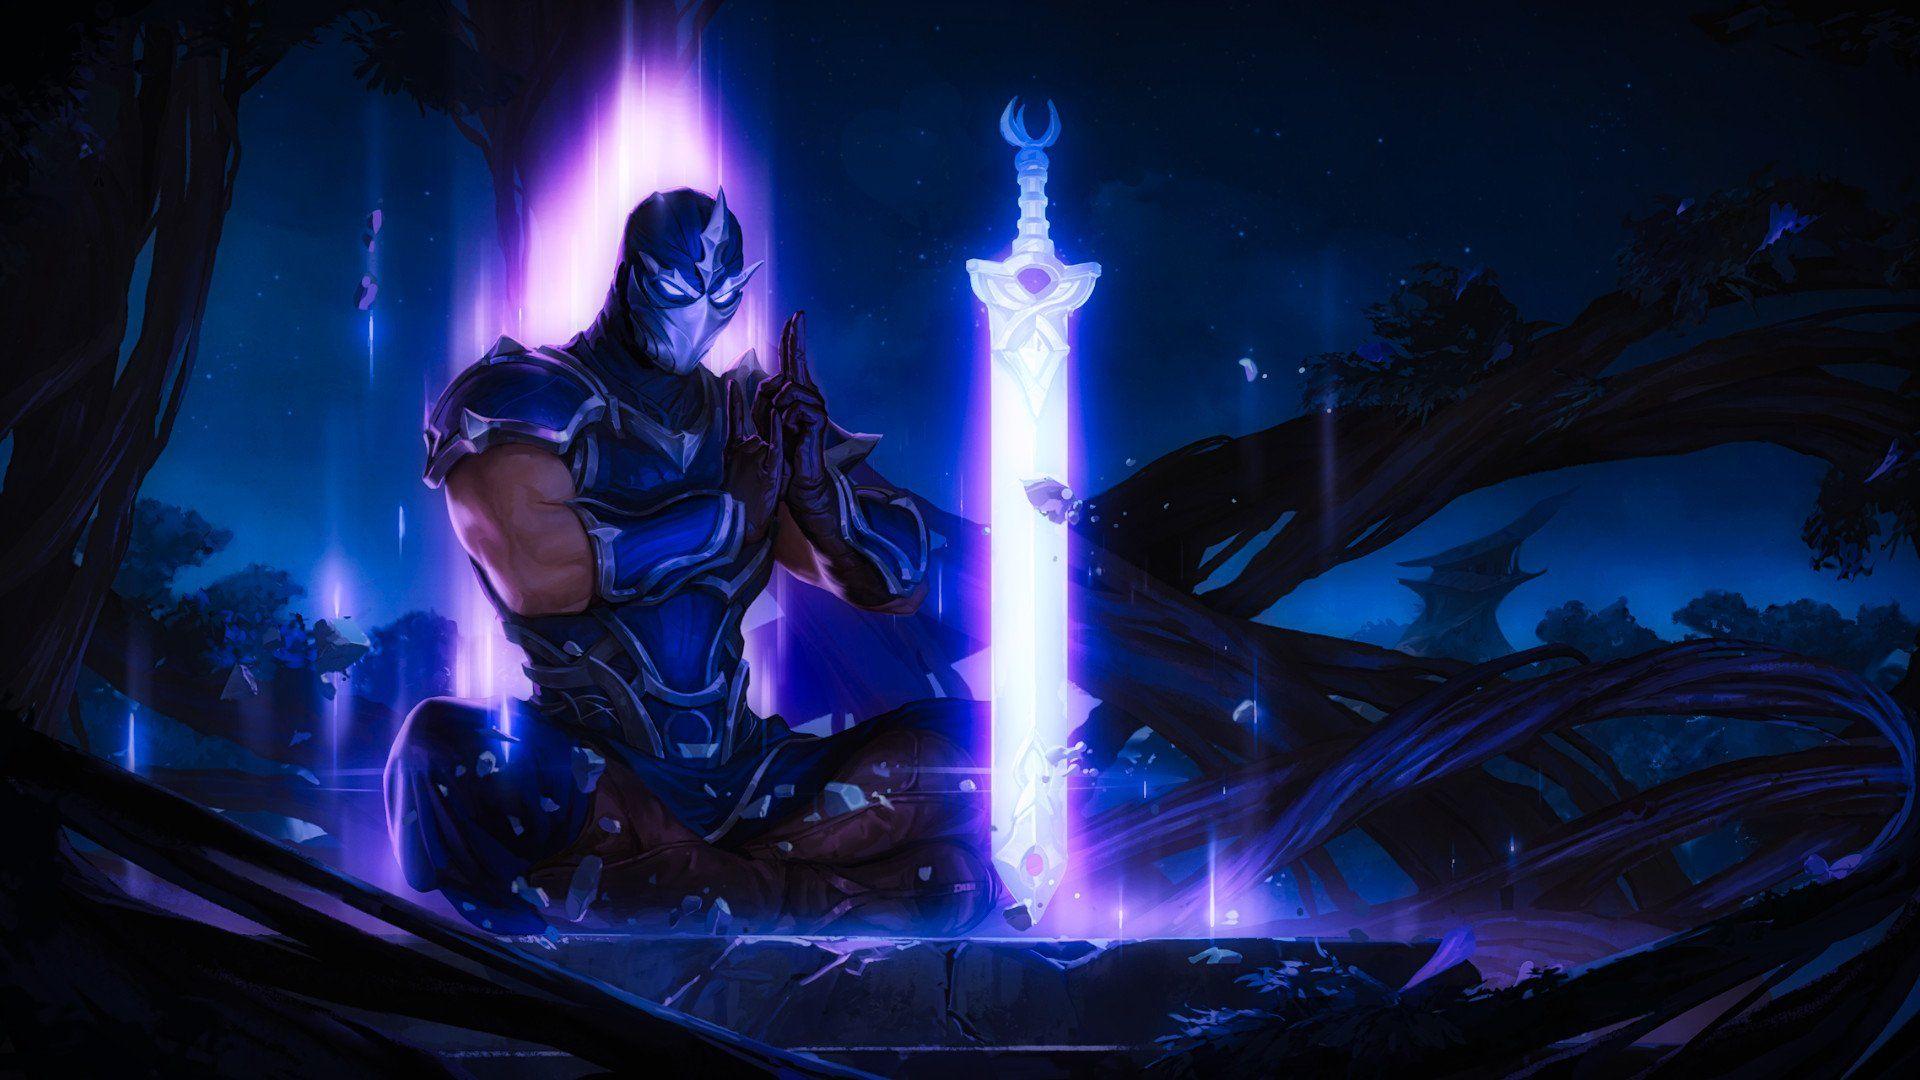 Legends Of Runeterra Wallpapers L2pbomb League Of Legends Characters League Of Legends Poster Lol League Of Legends